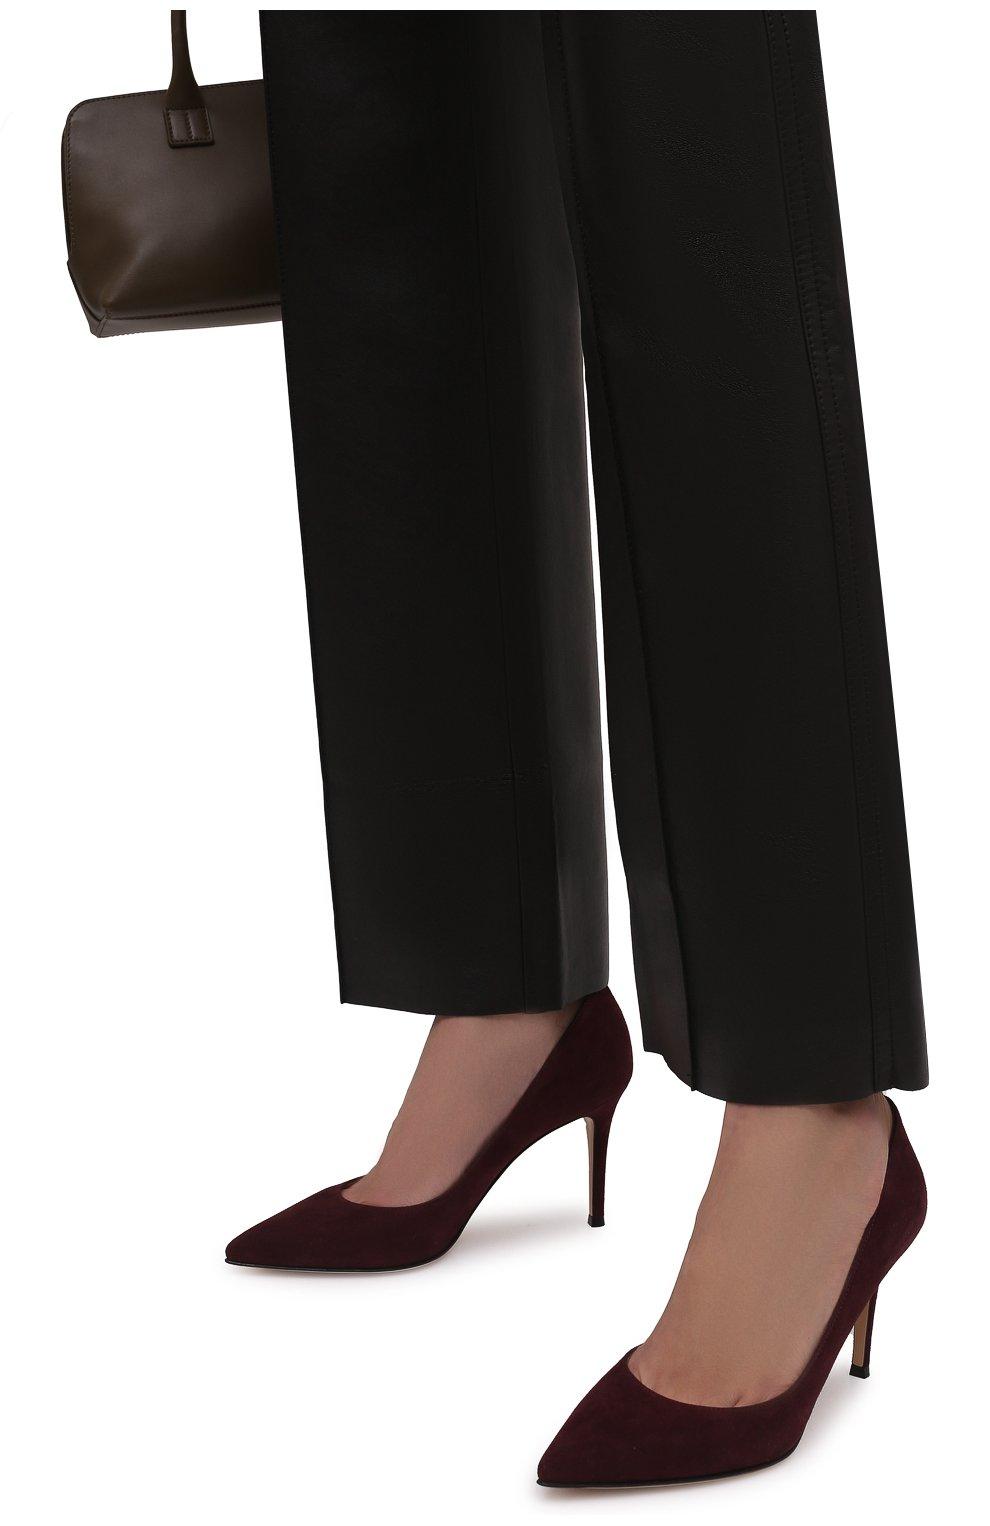 Женские замшевые туфли gianvito 85 GIANVITO ROSSI бордового цвета, арт. G24580.85RIC.CAMR0YA | Фото 3